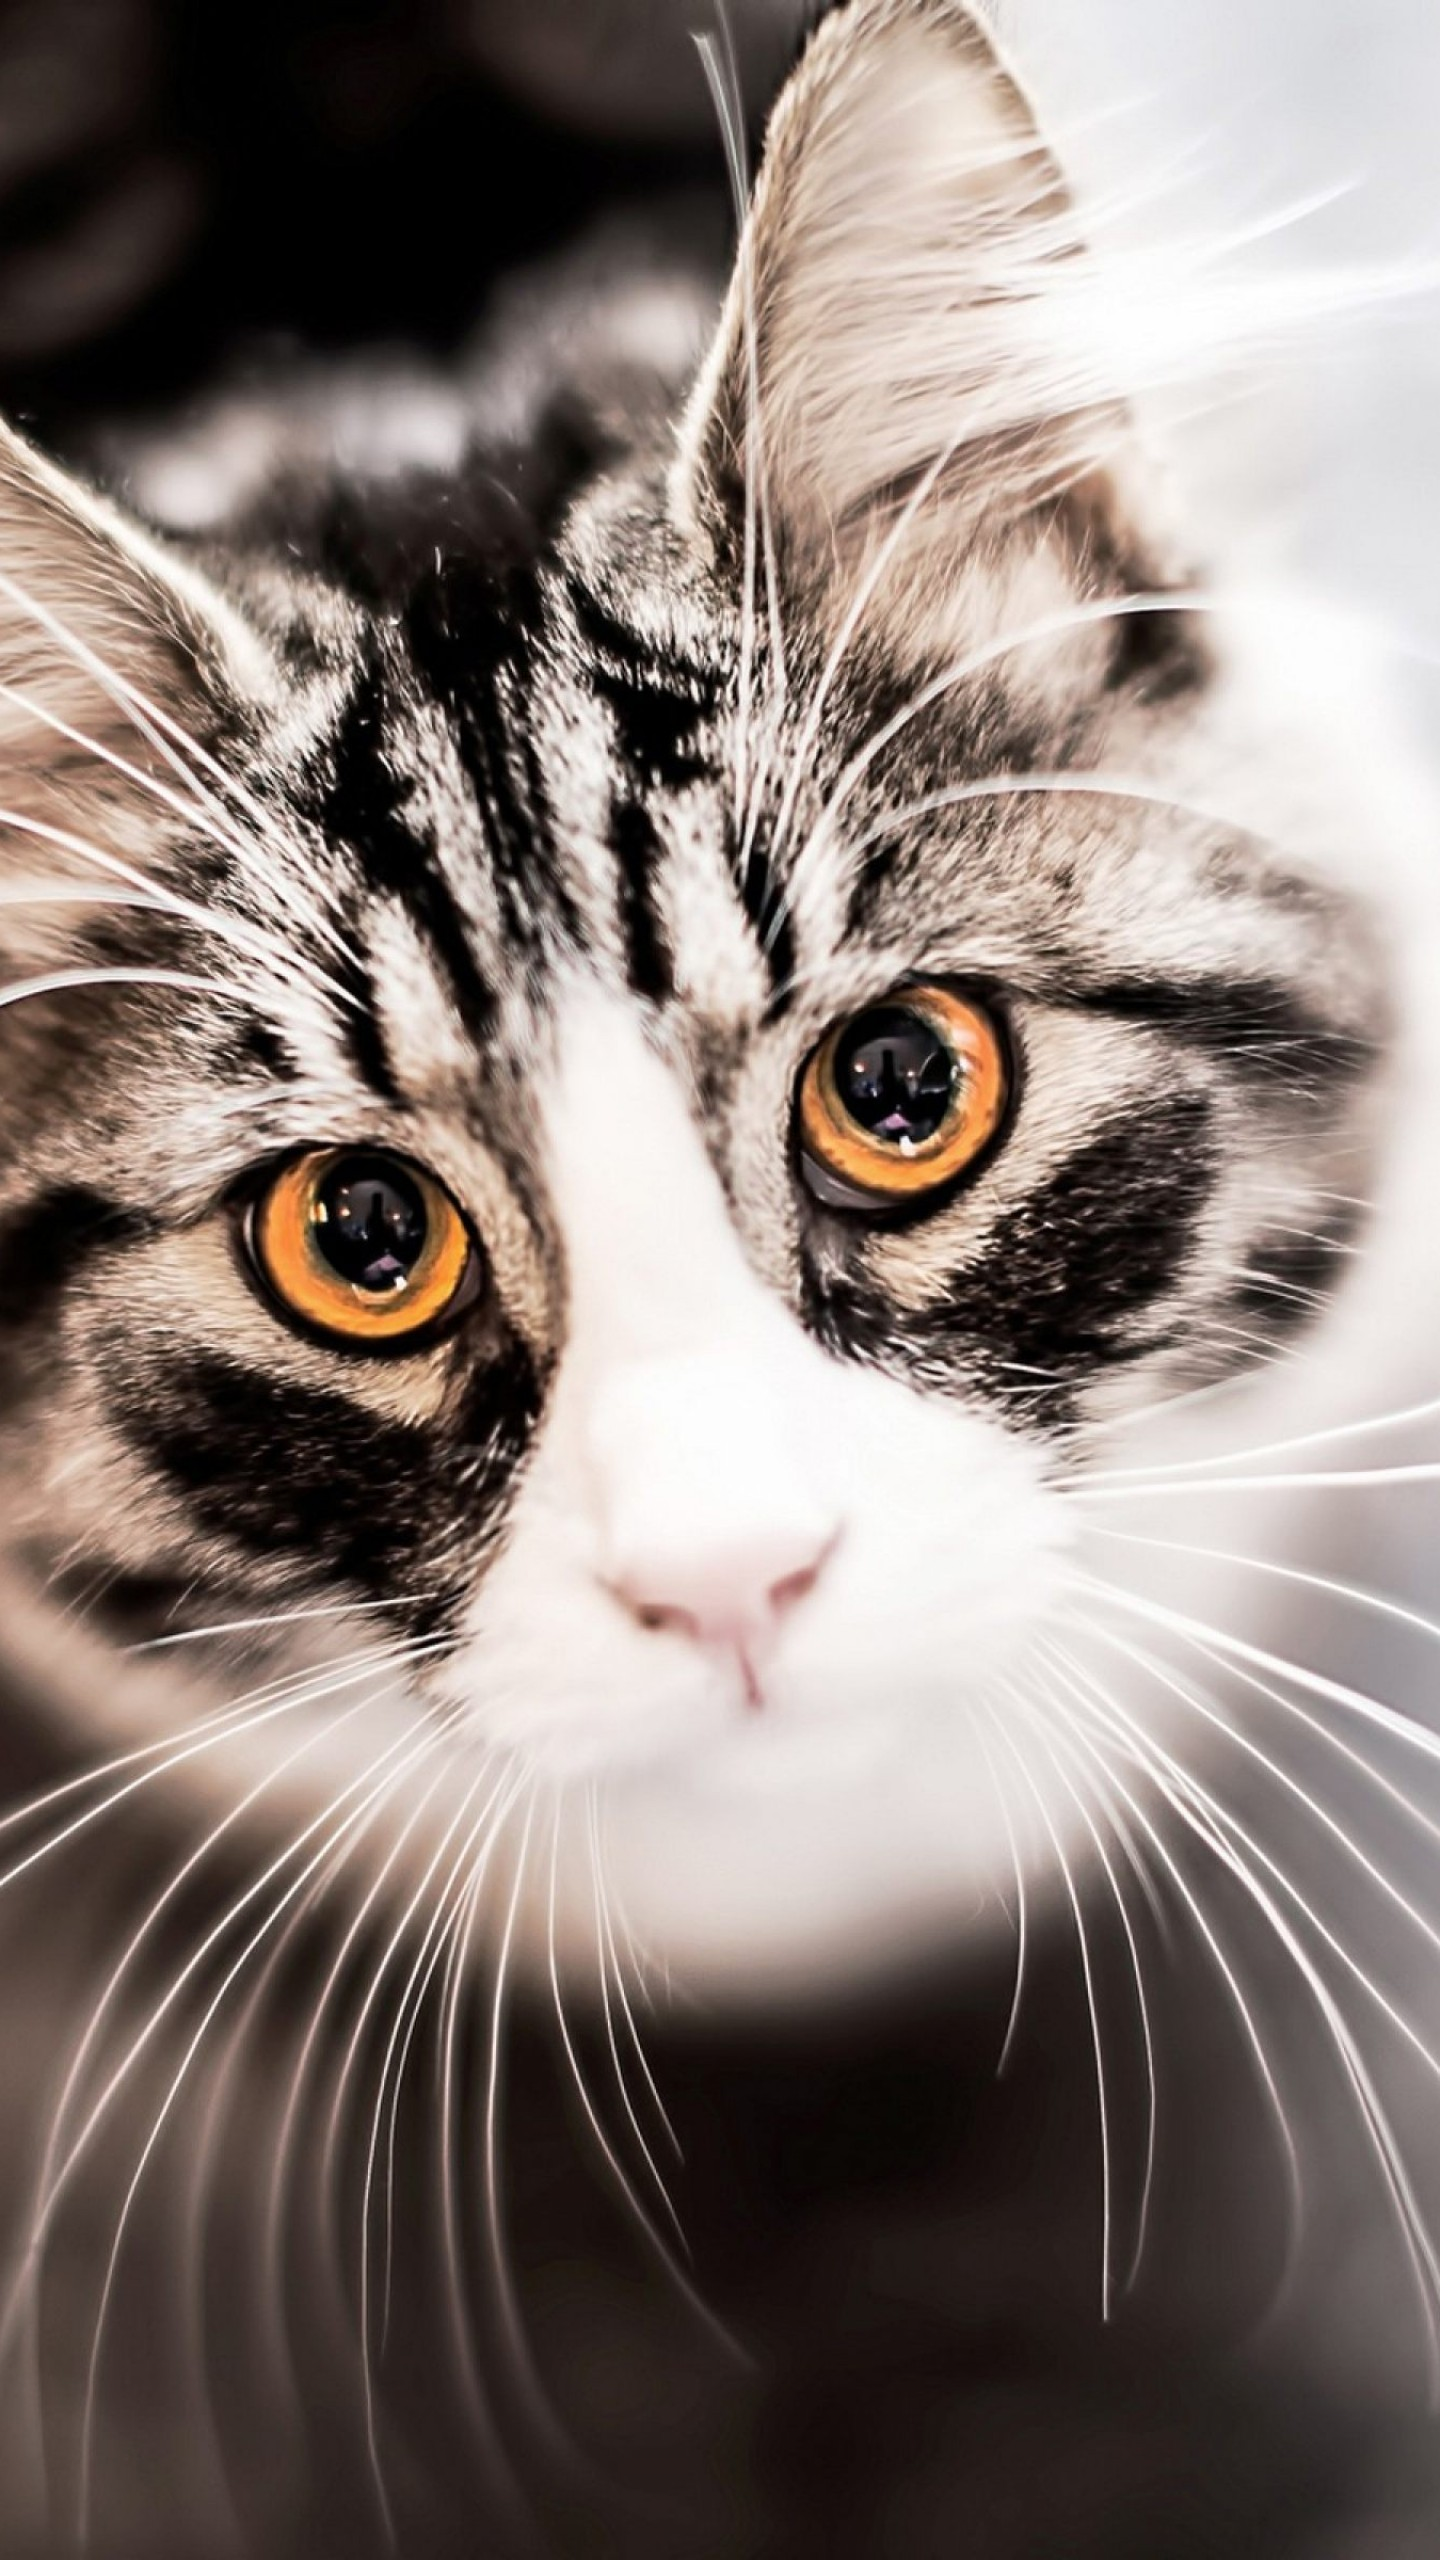 Wallpaper Kitty, Kitten, Cat, Eyes, Cute, Gray, Animals #9317